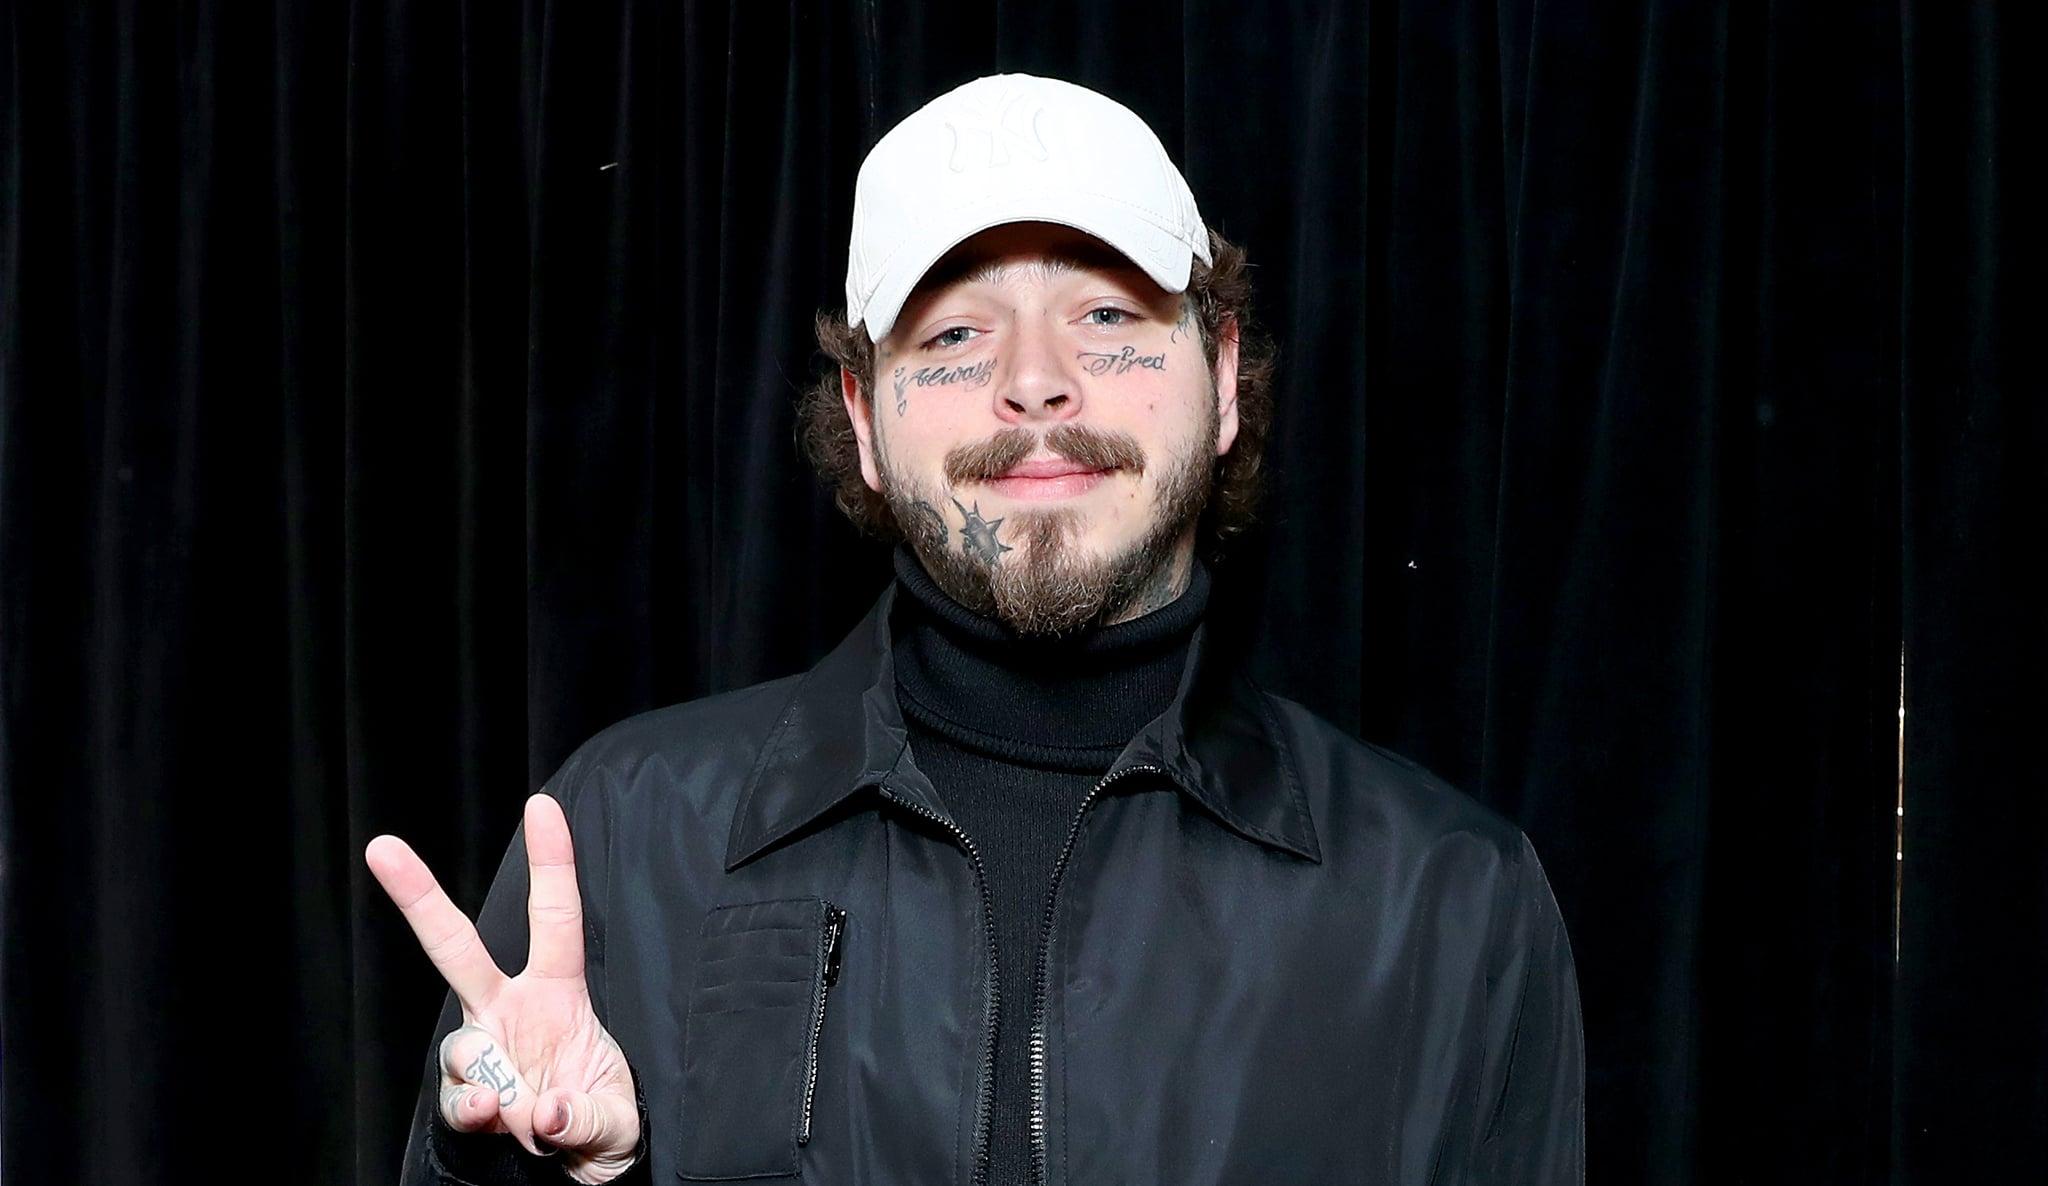 PARK CITY, UTAH - JANUARY 26: Post Malone attends the 2020 Sundance Film Festival -